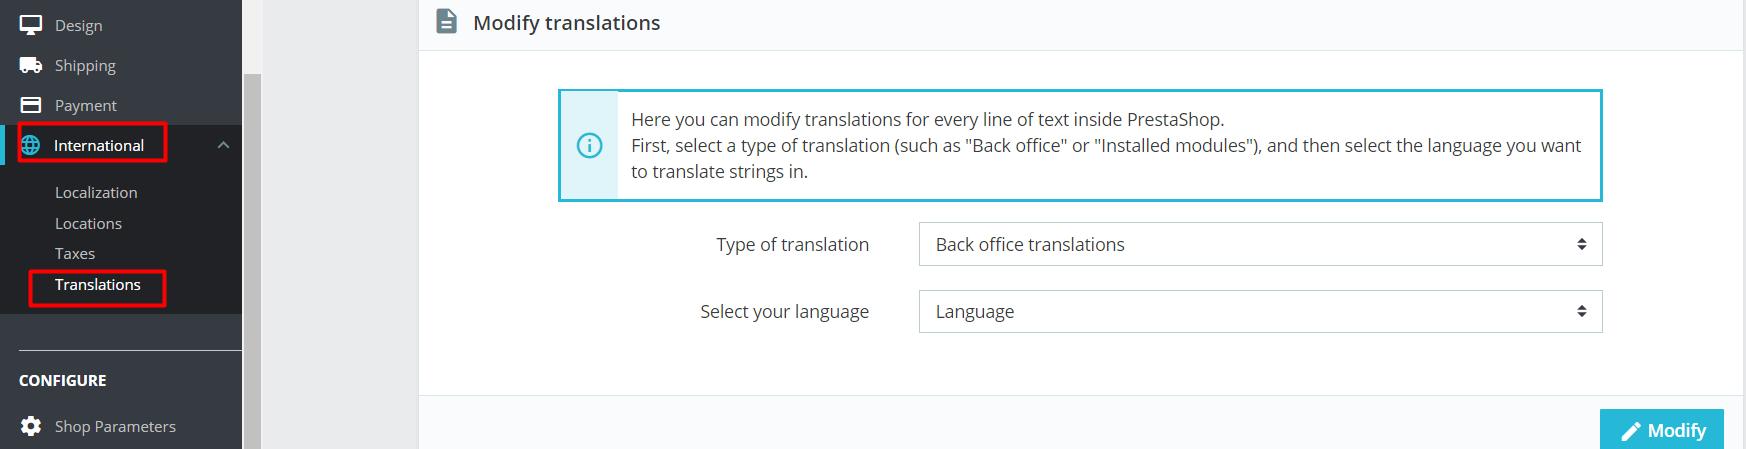 modify translations